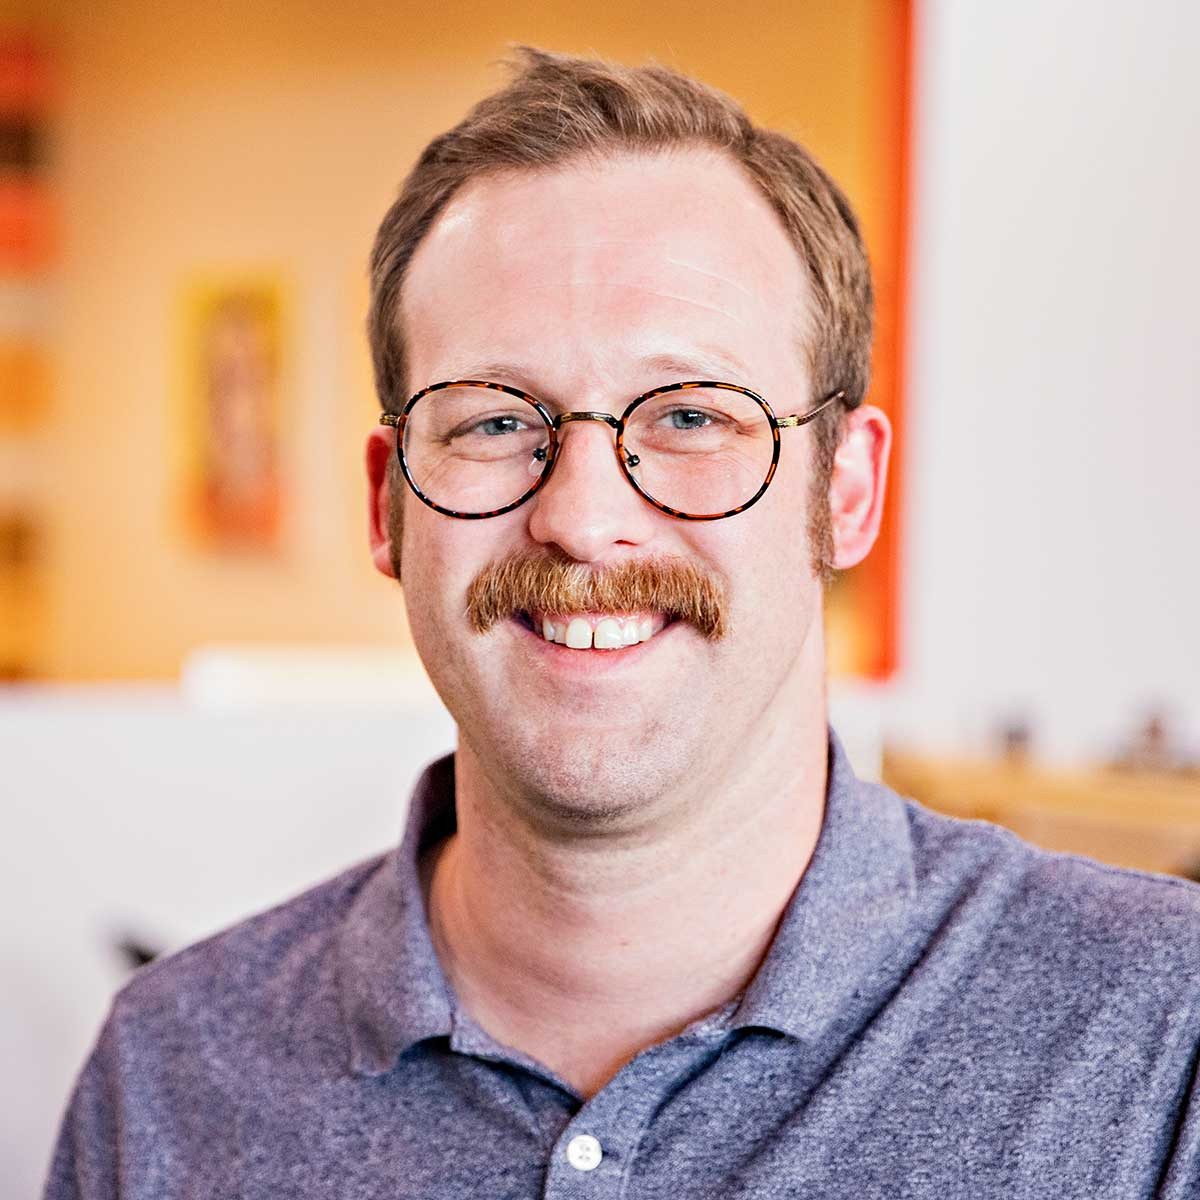 Steve Loftis, Creative Director at Insight Creative Group